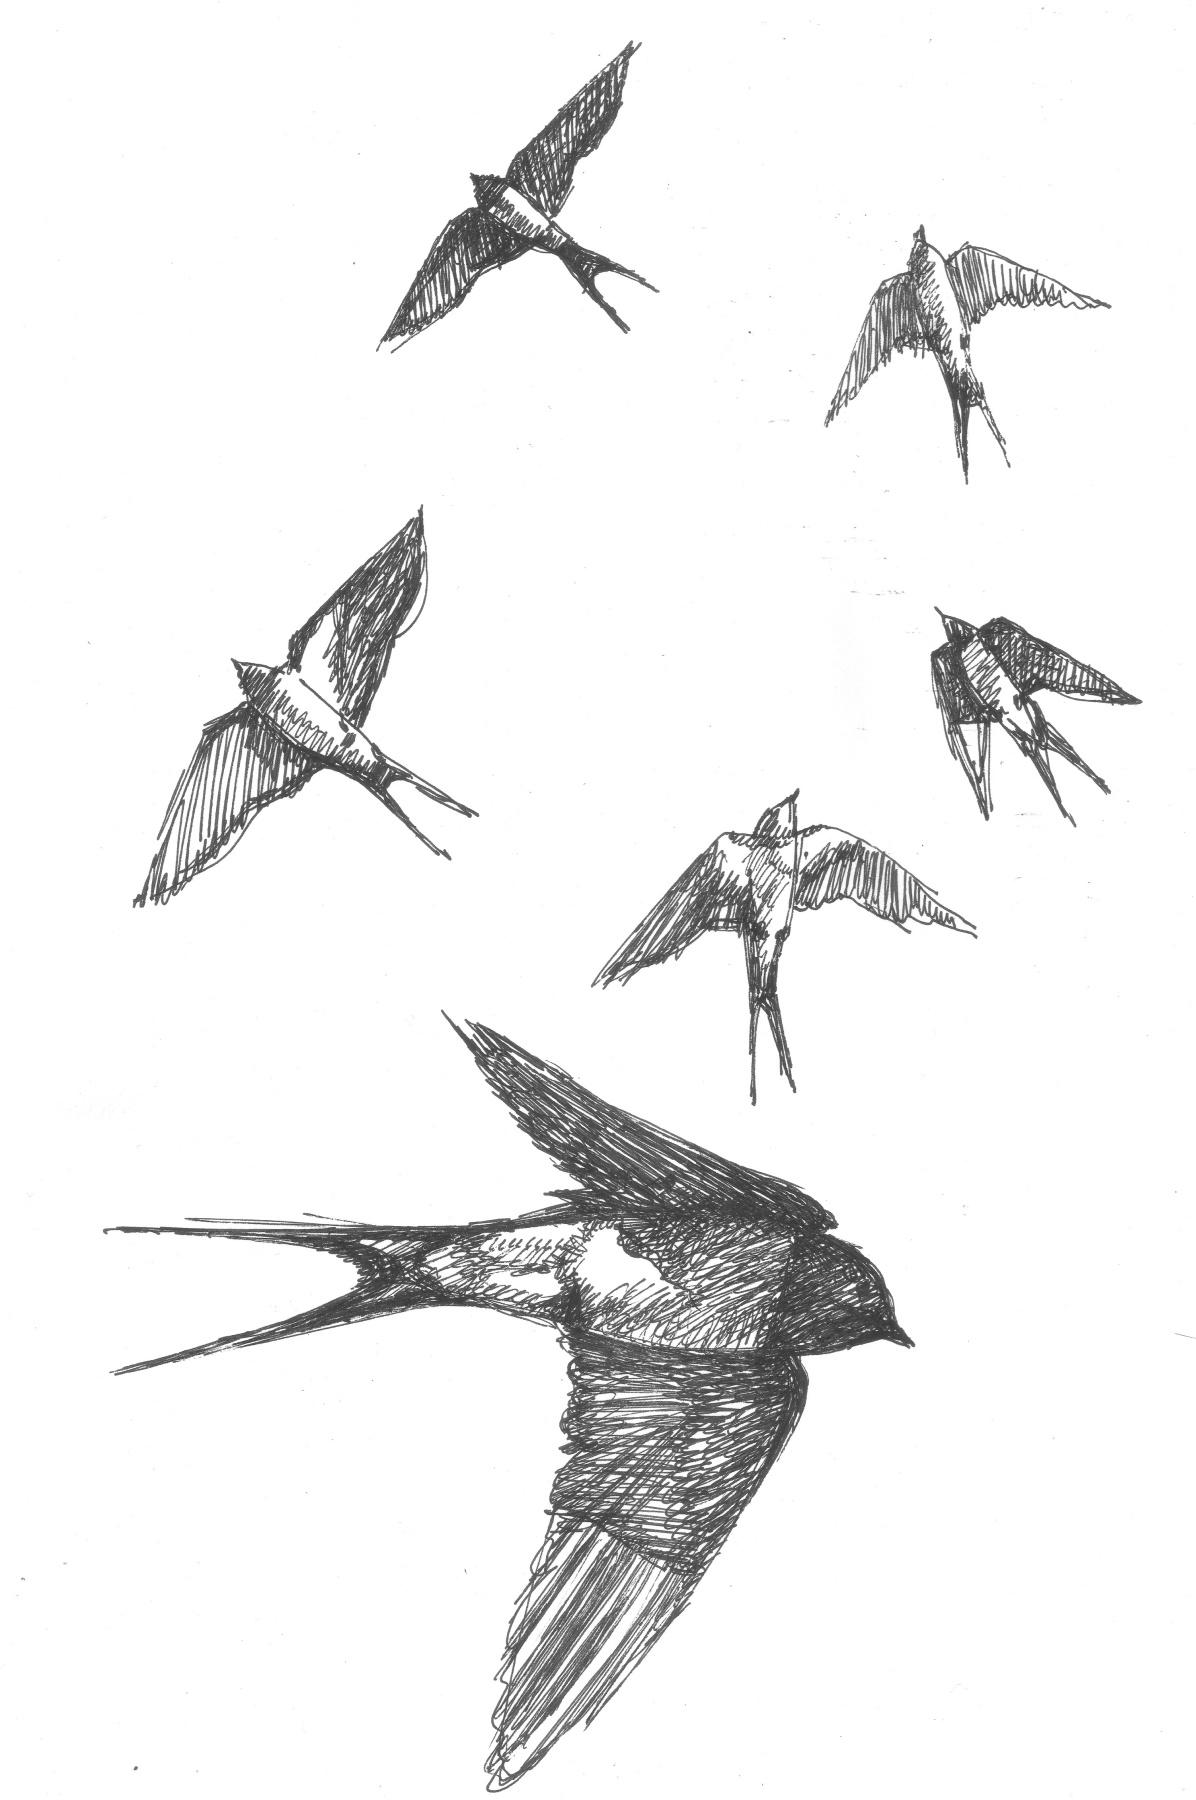 Александр Викторович Беляков. Swallows 2. From the series Birds.